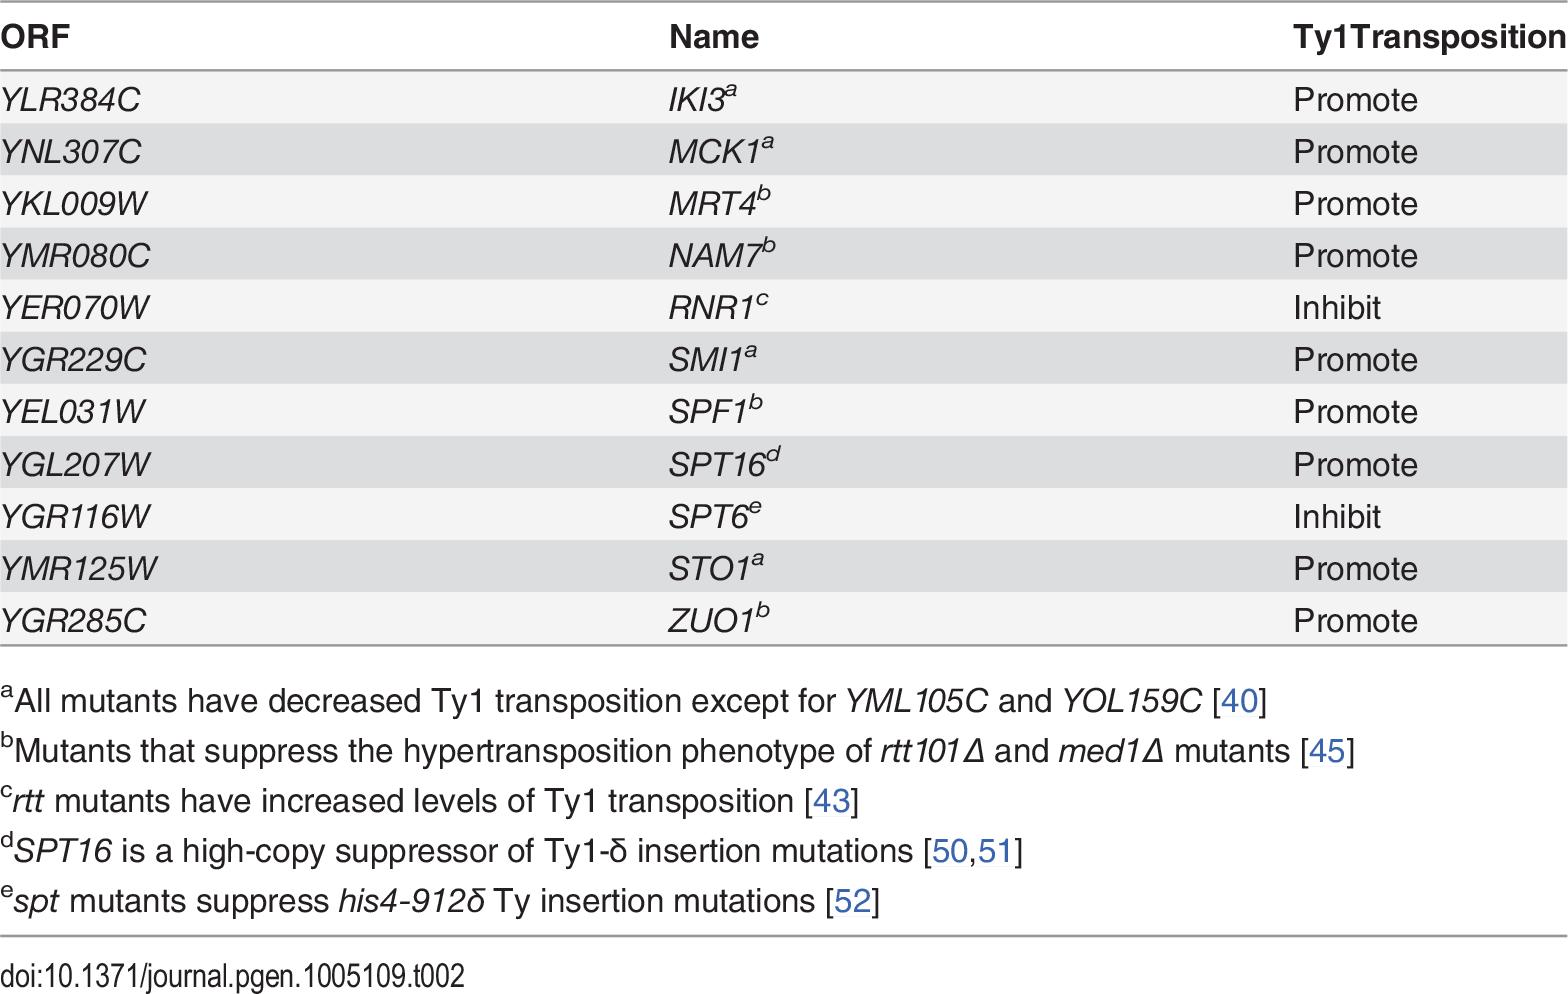 Genes identified in Esp1-13Myc mass spectrometry screen implicated in Ty1 transposition.